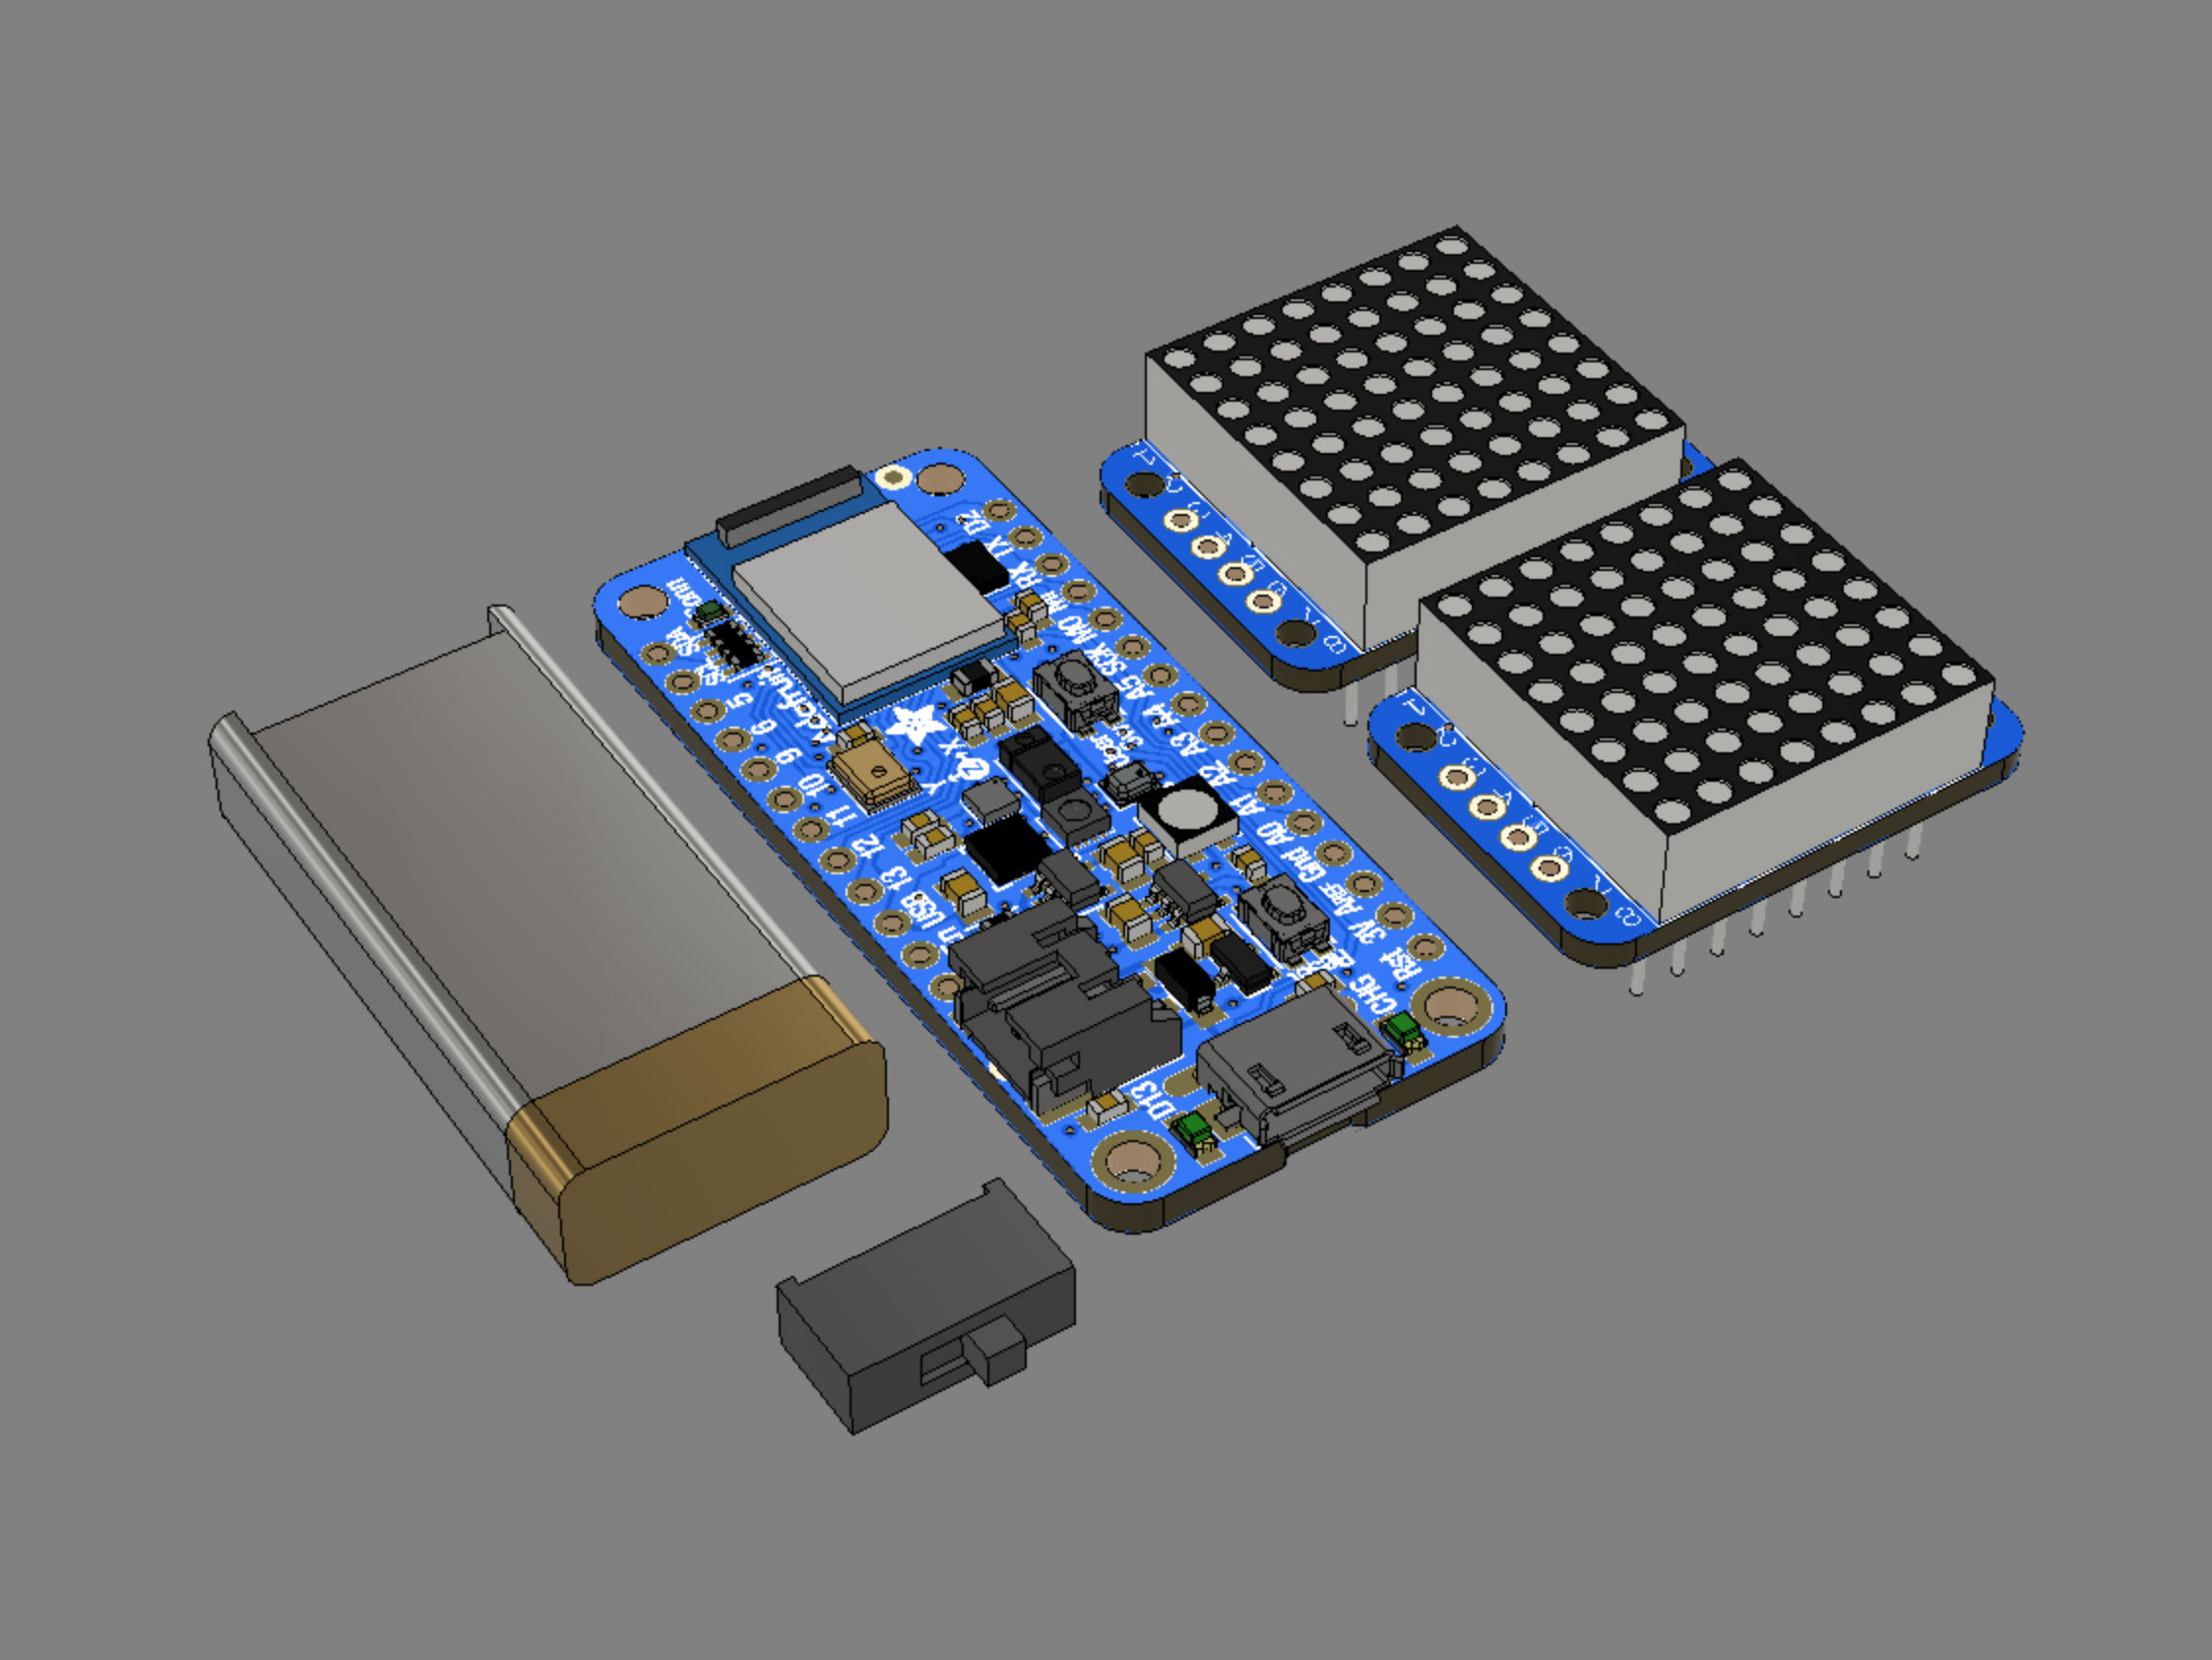 led_matrices_3d-cad-parts.jpg